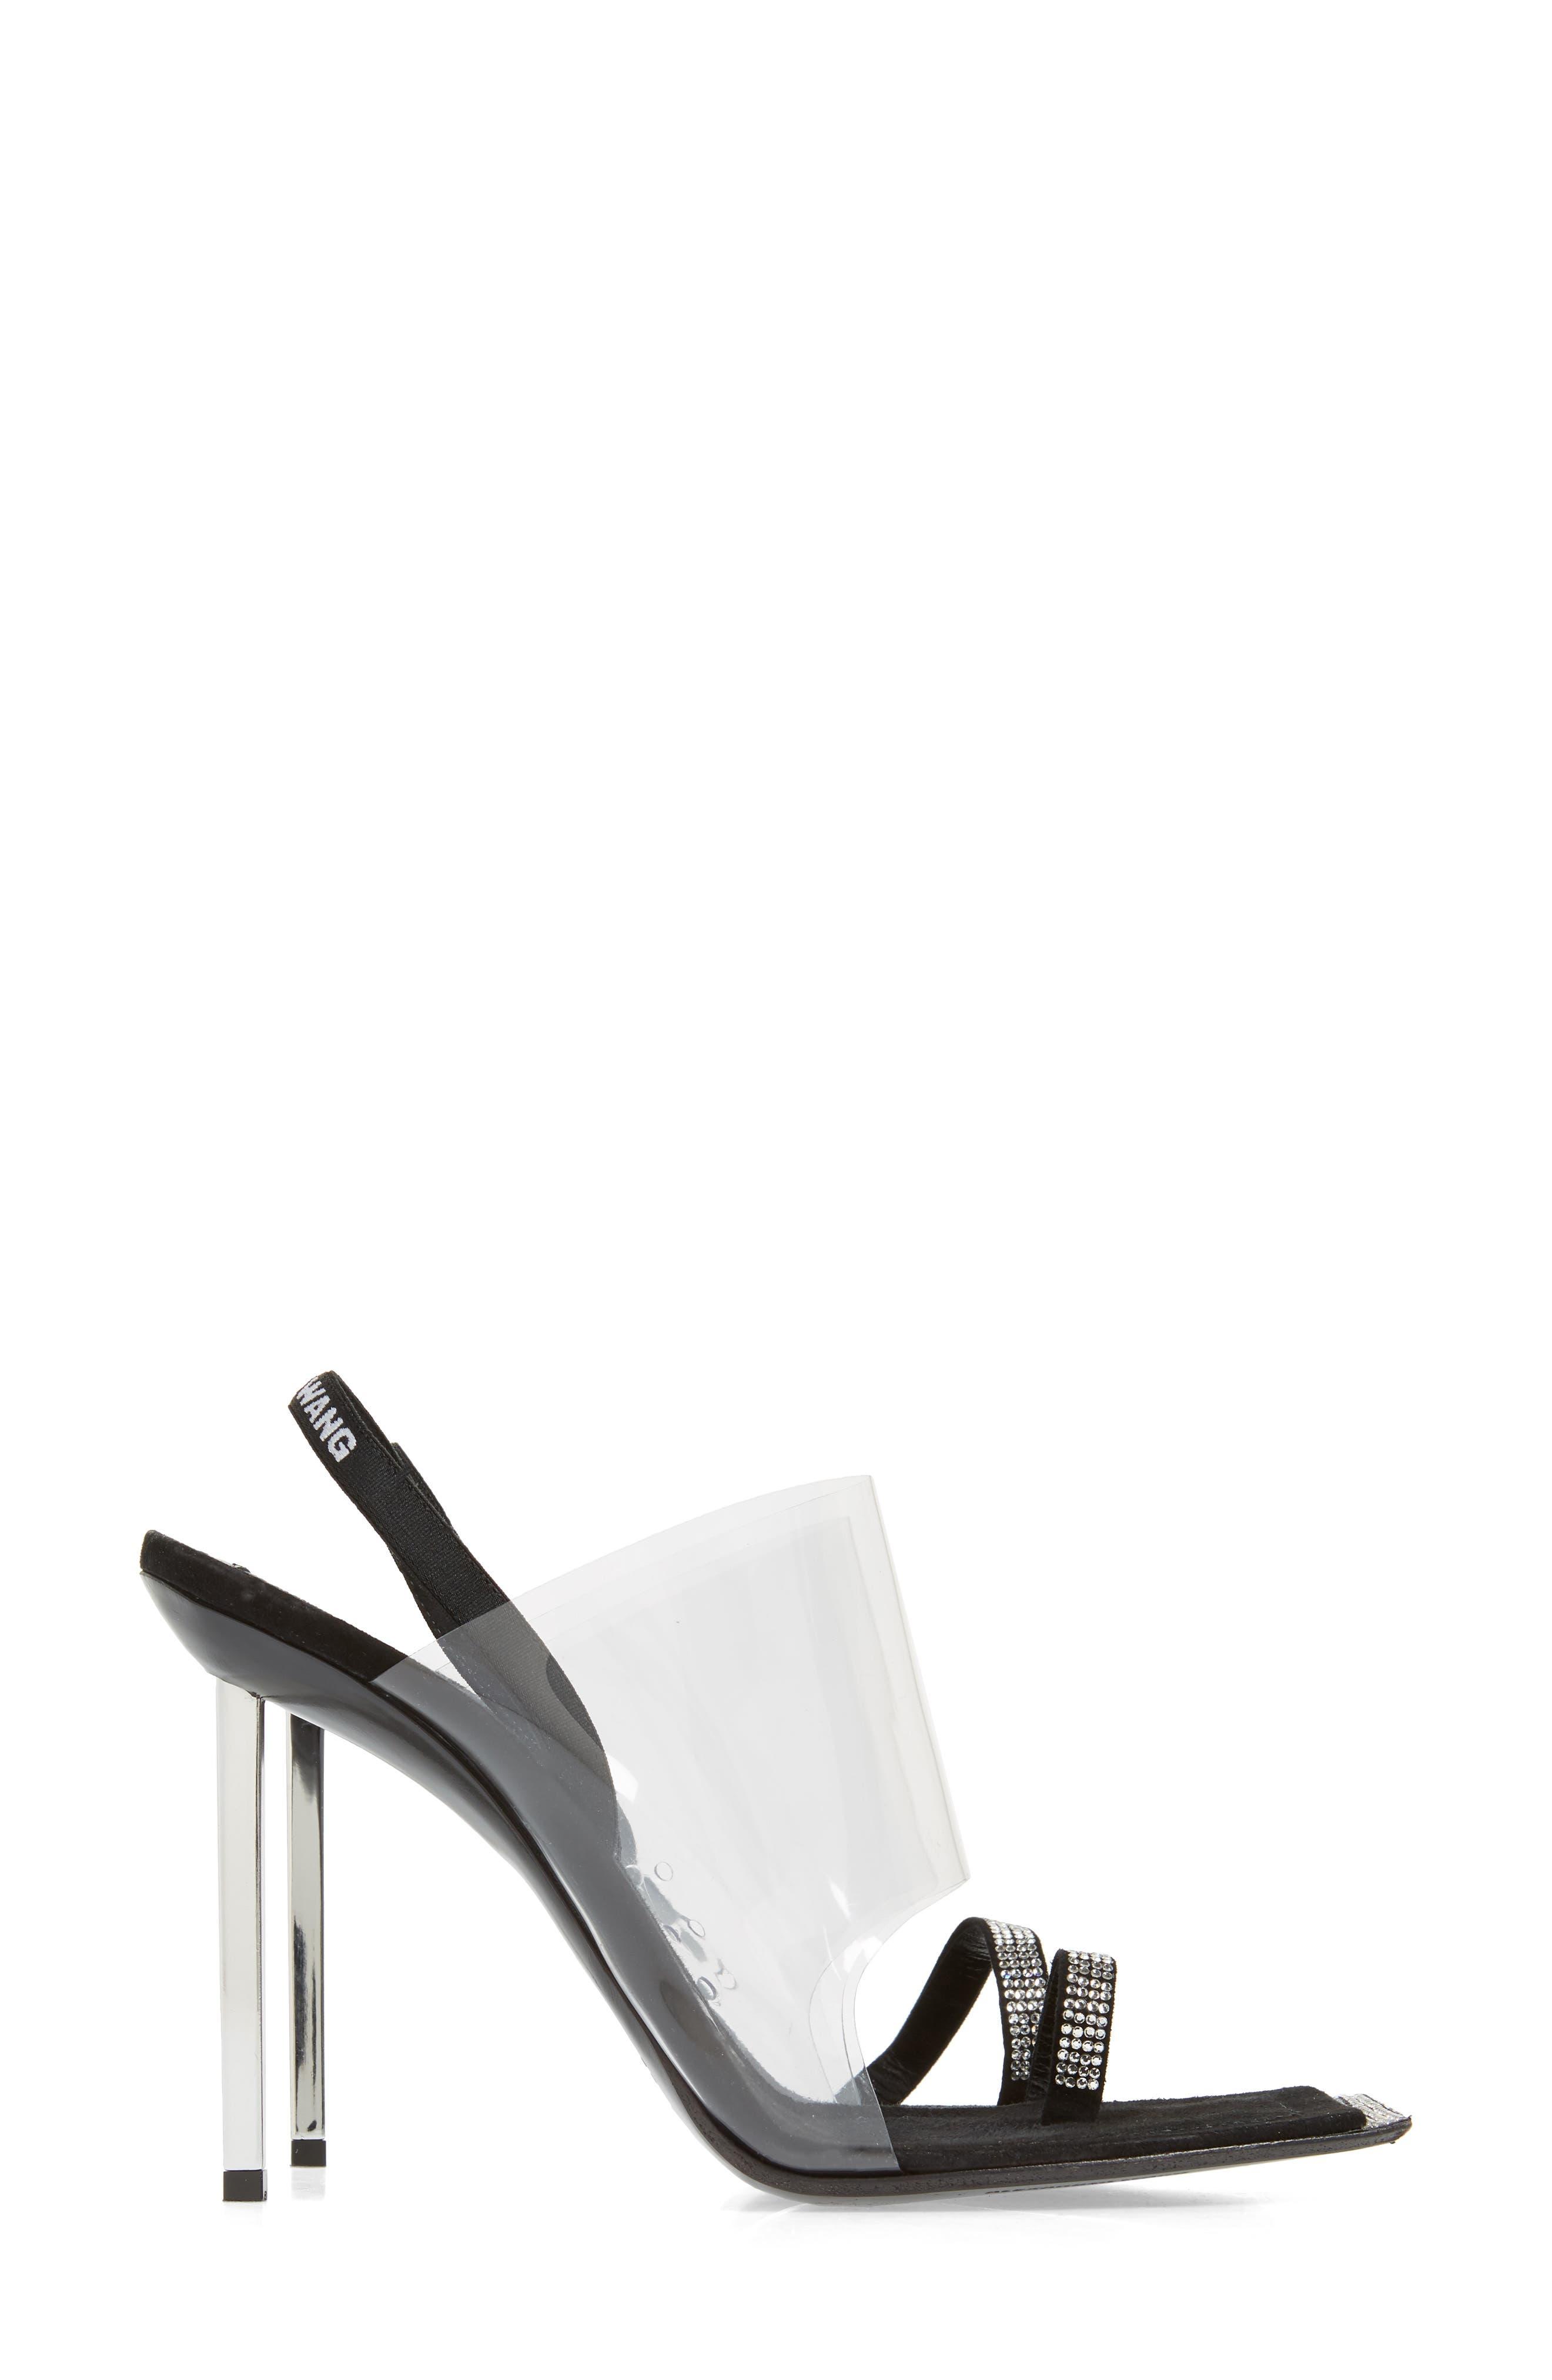 ALEXANDER WANG, Clear Shield Sandal, Alternate thumbnail 4, color, BLACK